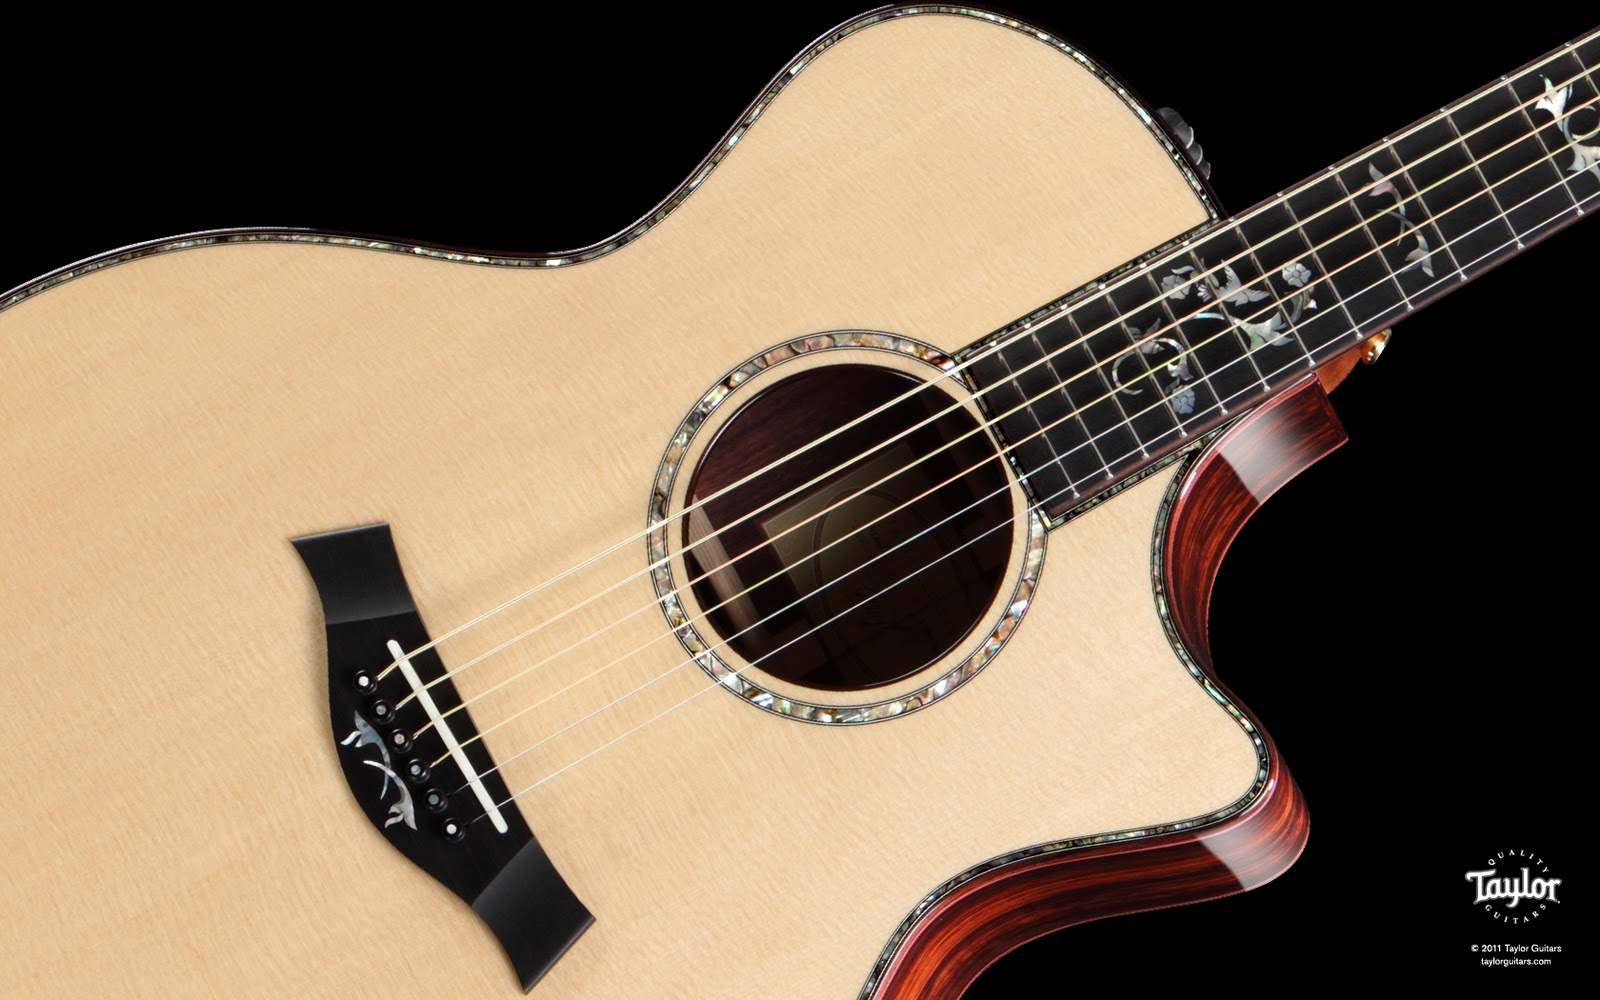 Taylor Guitar Background Wallpaper - WallpaperSafariTaylor Swift Acoustic Guitar Wallpaper